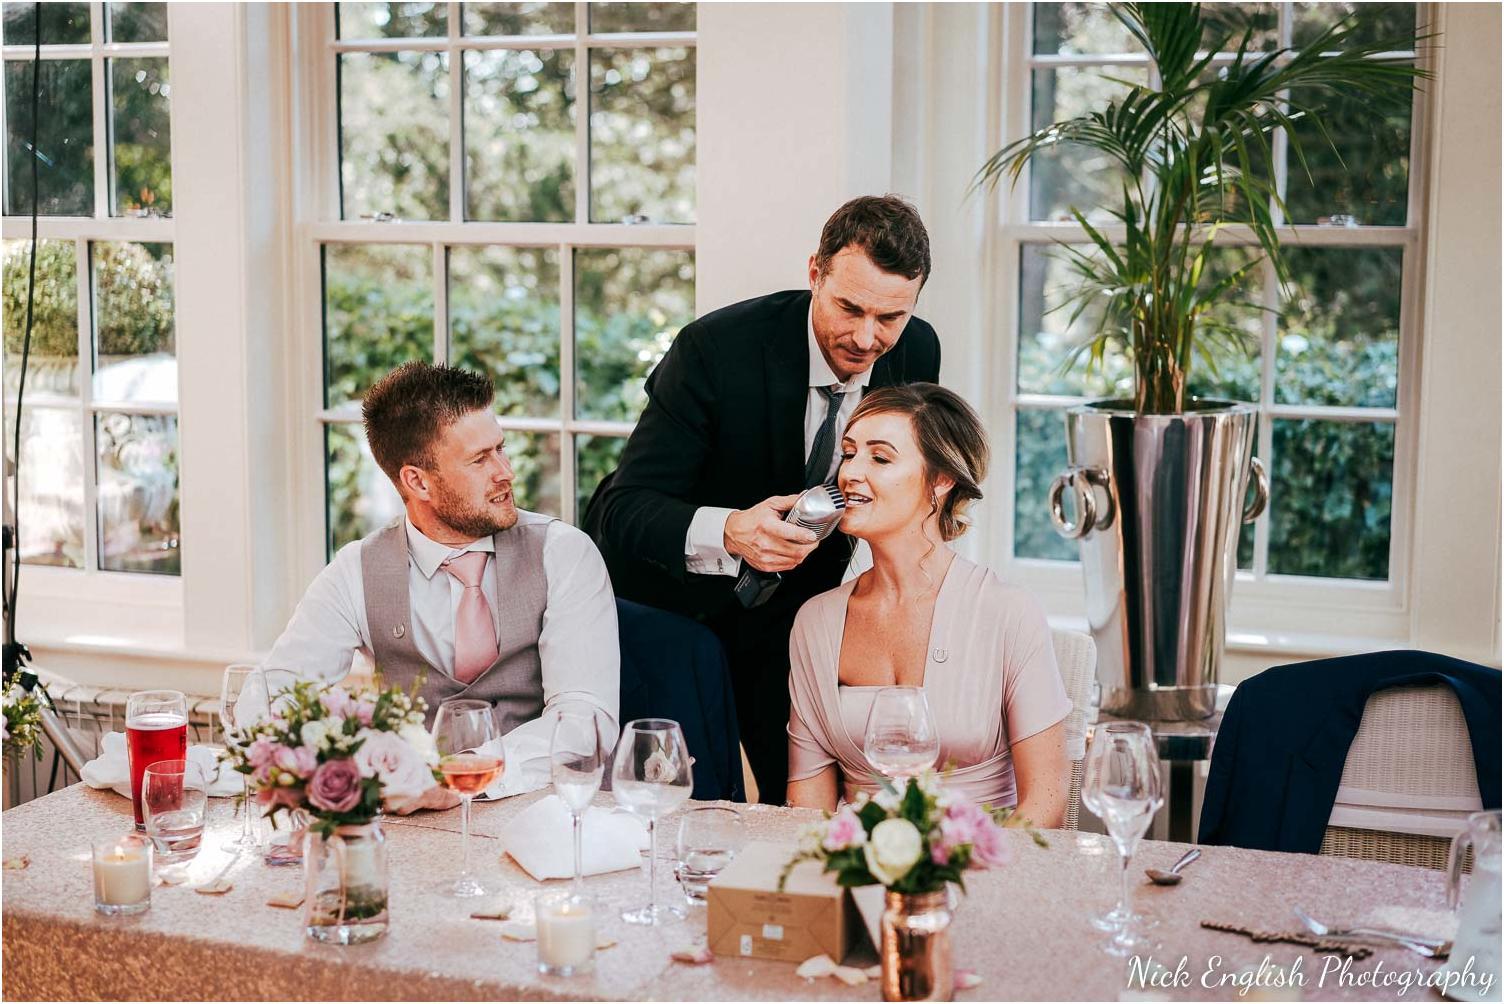 Mitton_Hall_Wedding_Photograph-128.jpg